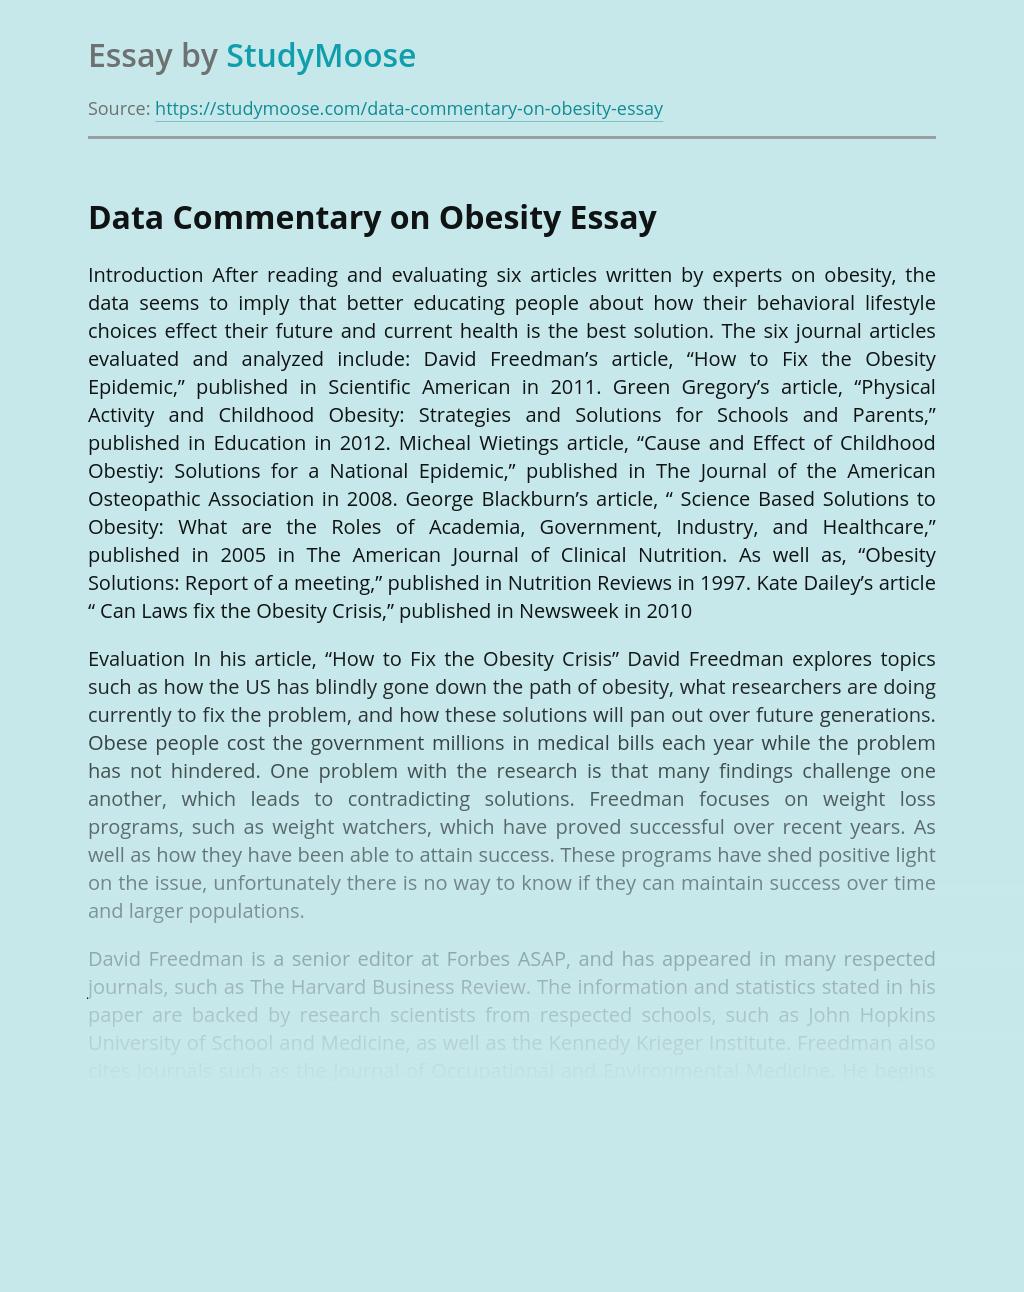 Data Commentary on Obesity